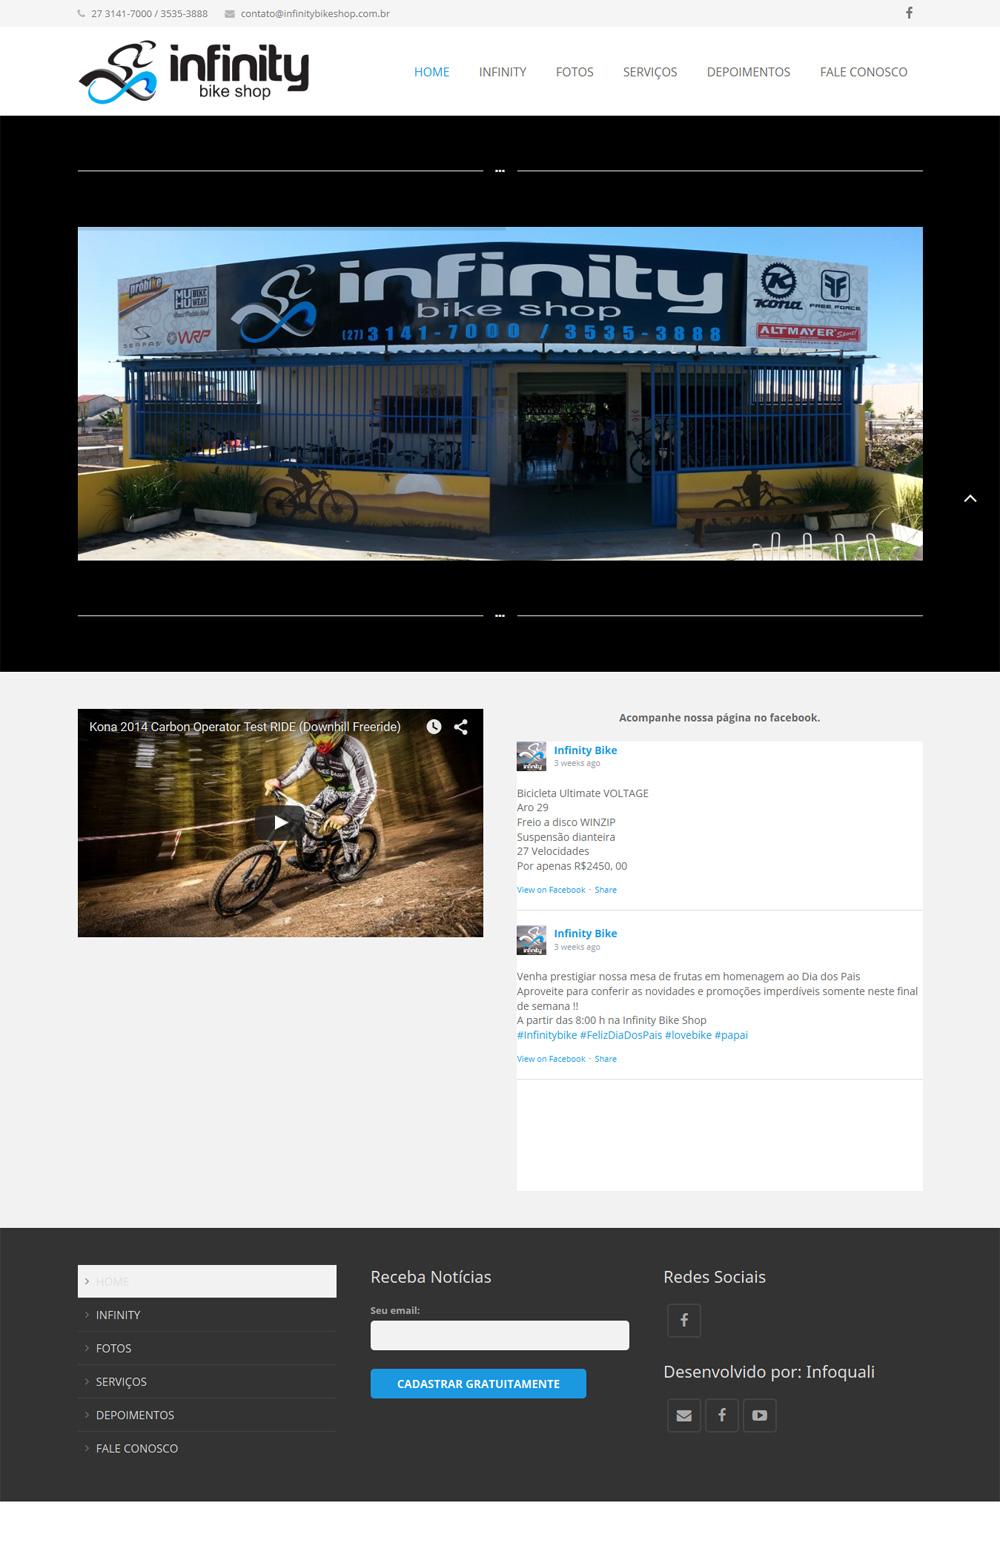 Infinity_Bike_Shop